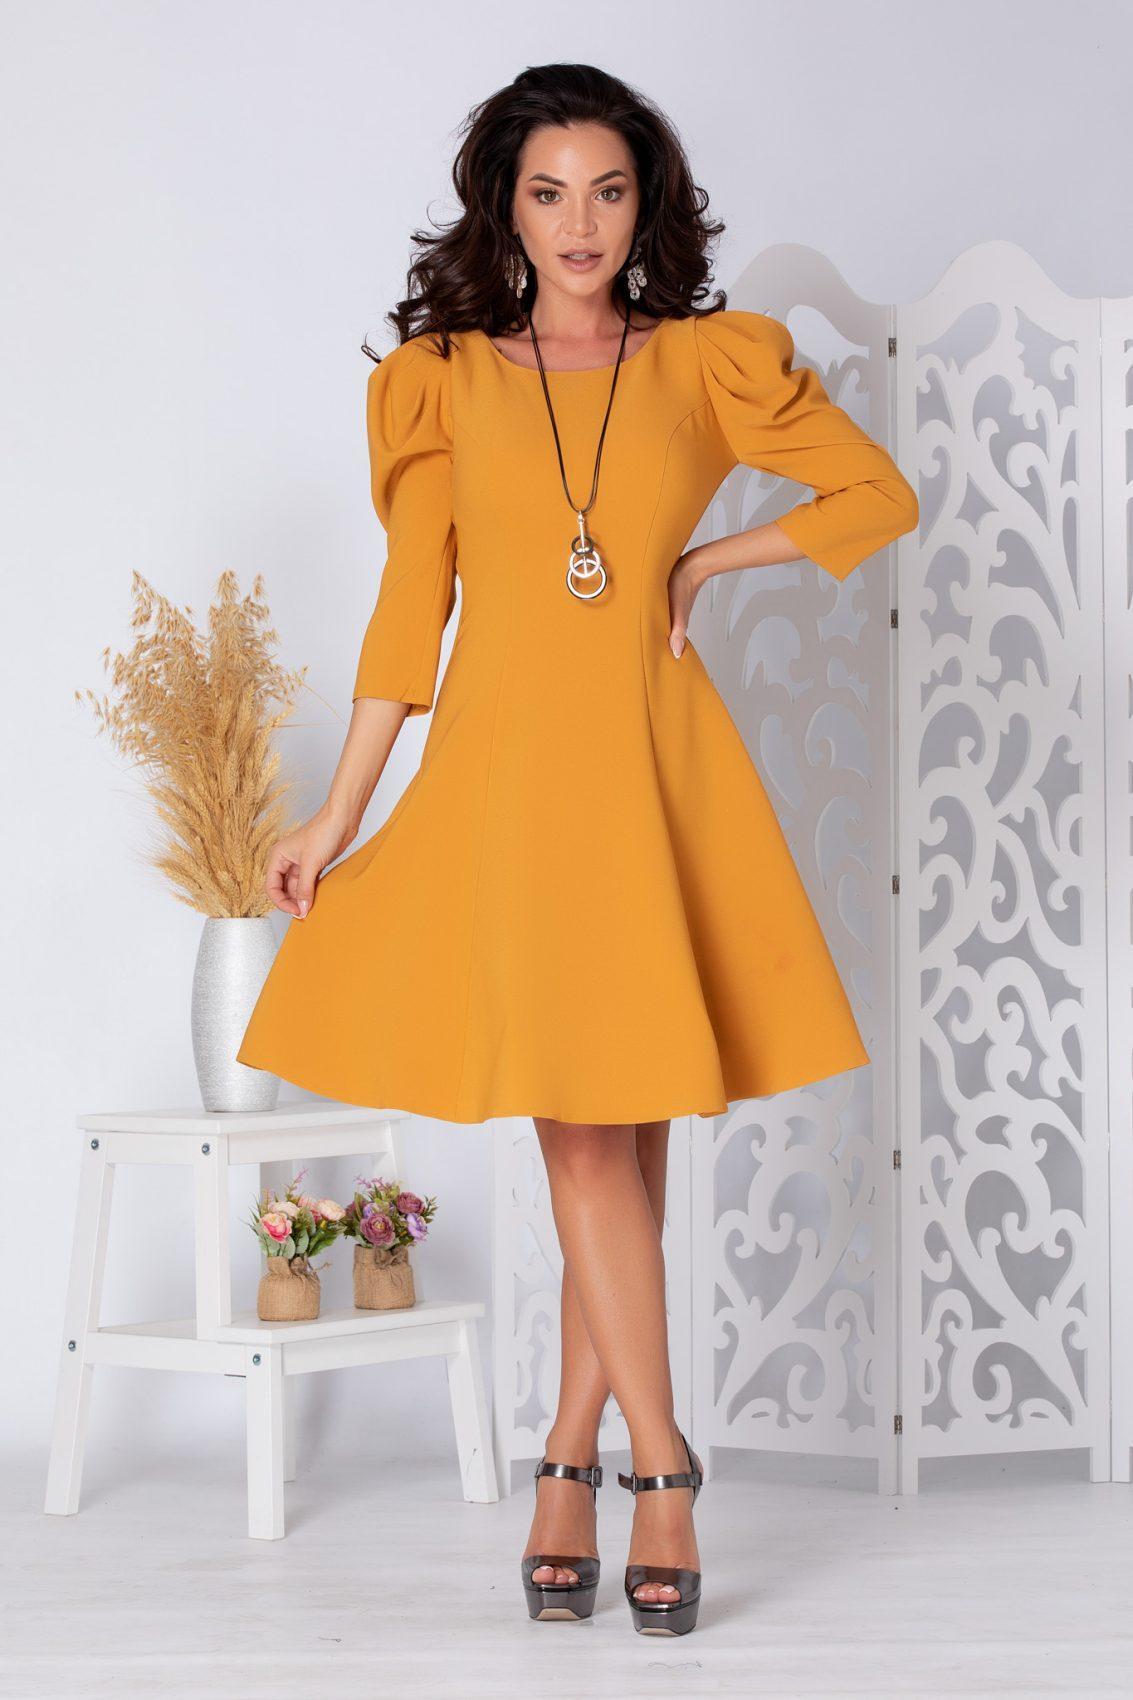 Maya Κίτρινο Φόρεμα 5500